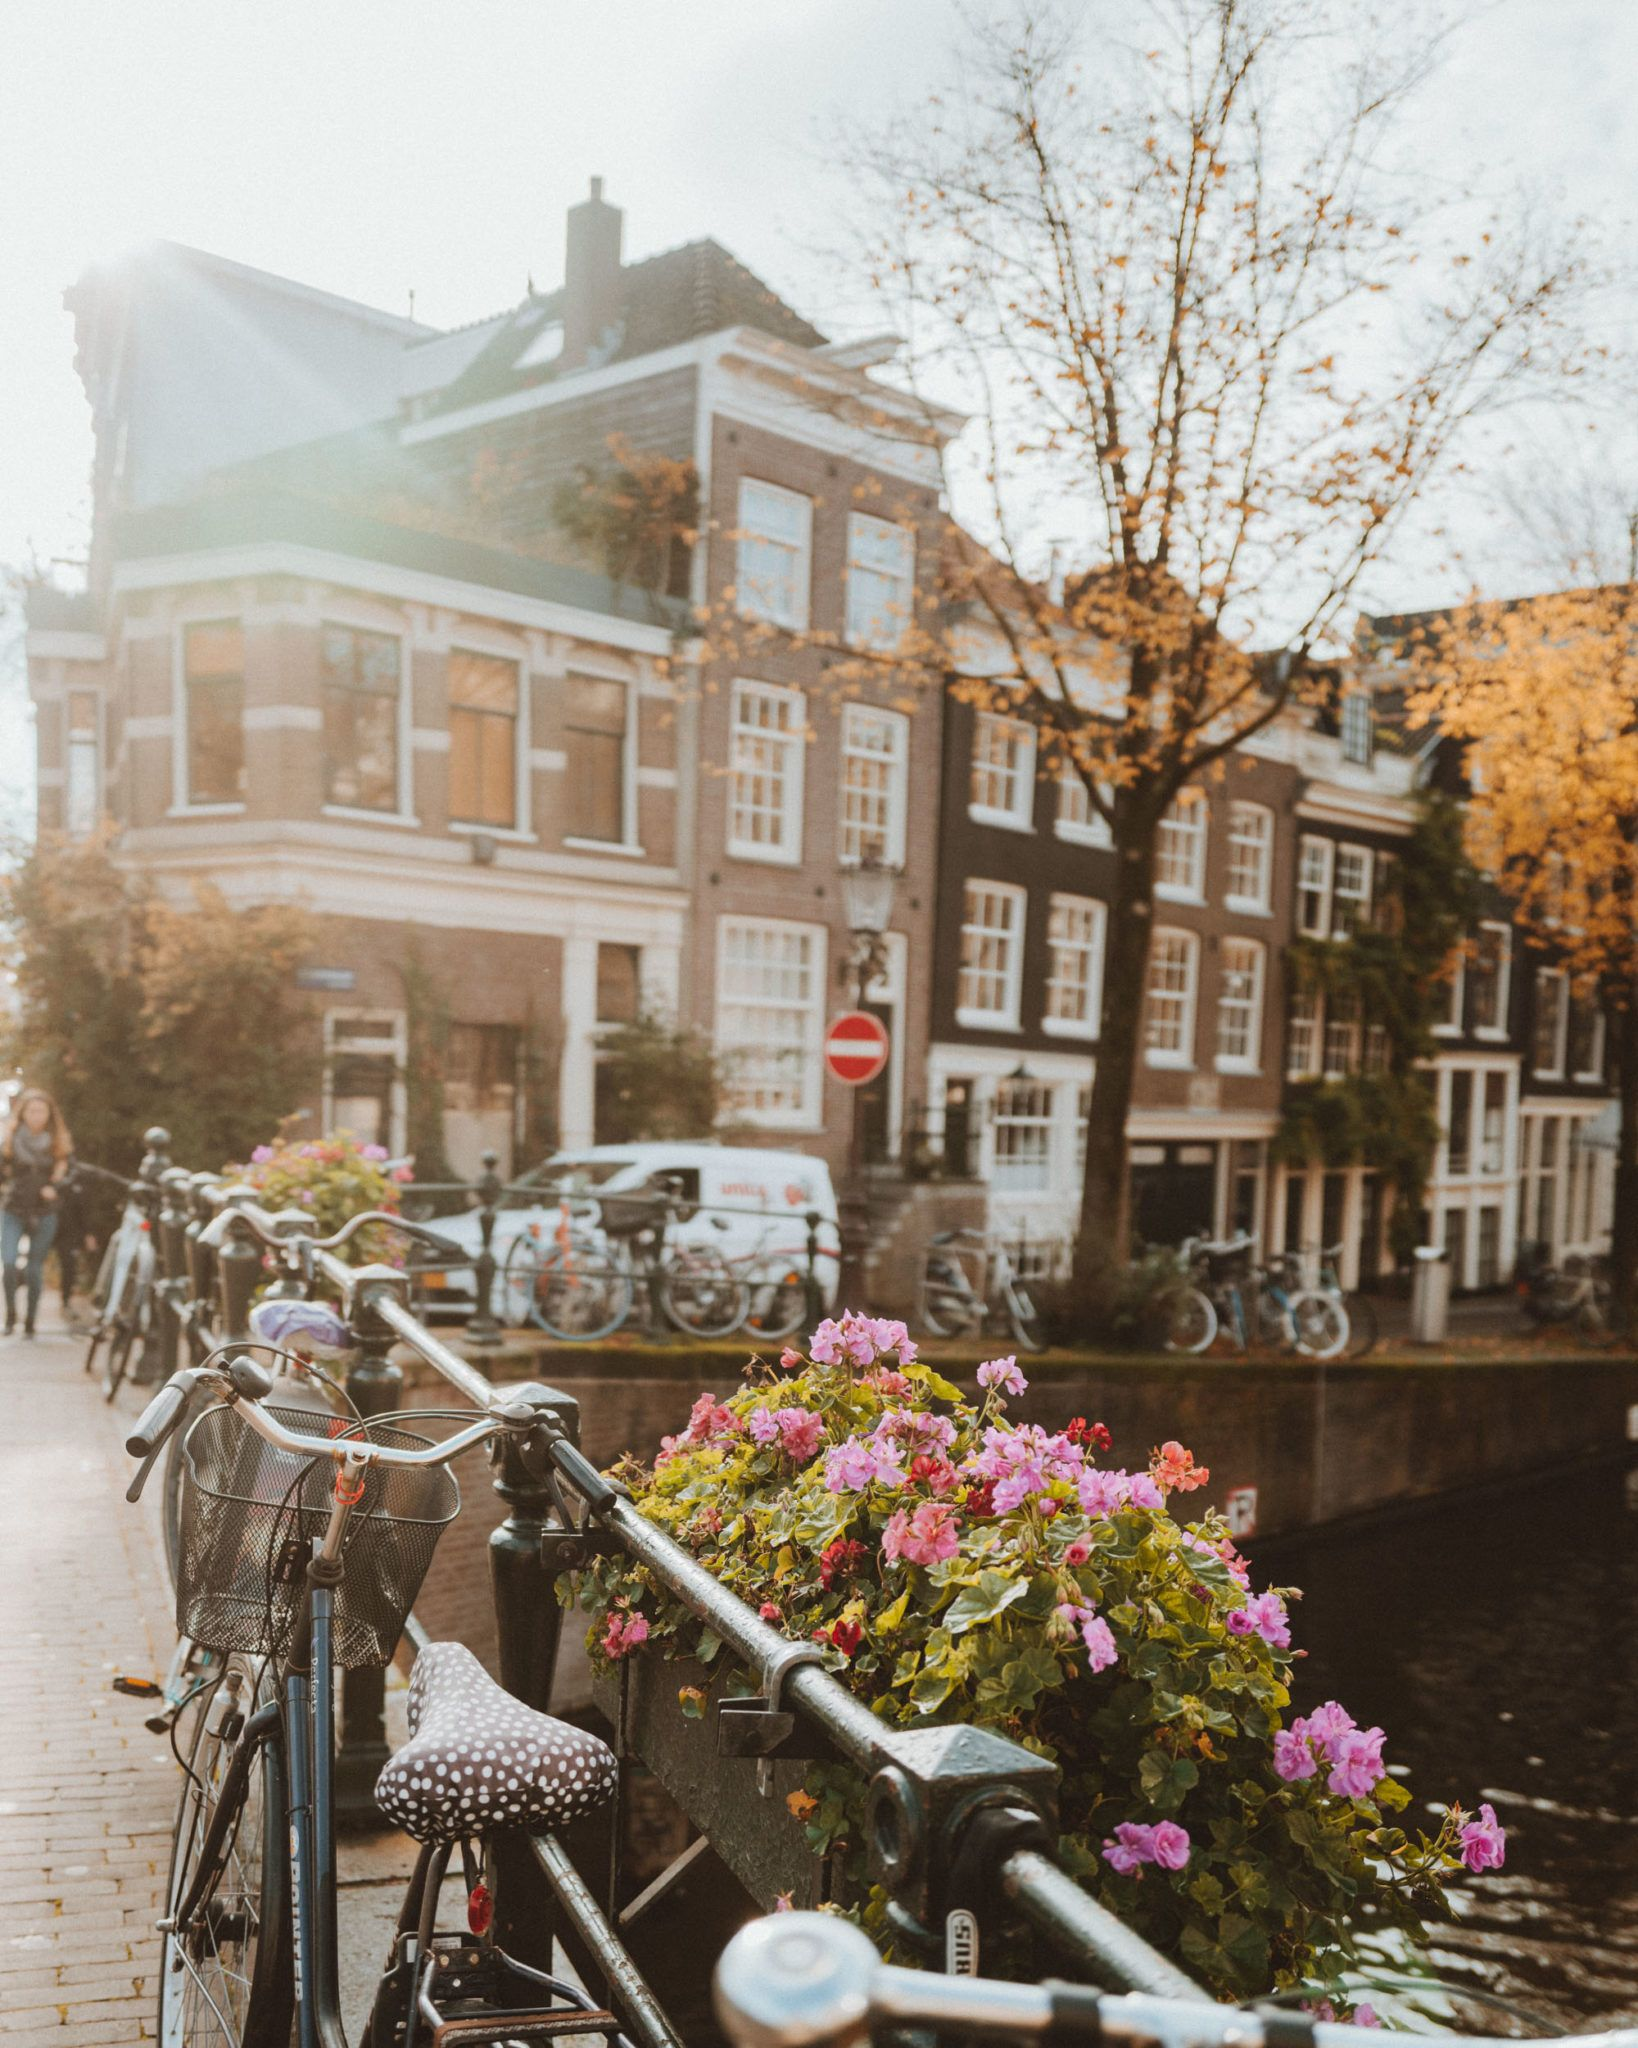 Our Favorite Restaurants in Amsterdam - Find Us Lost